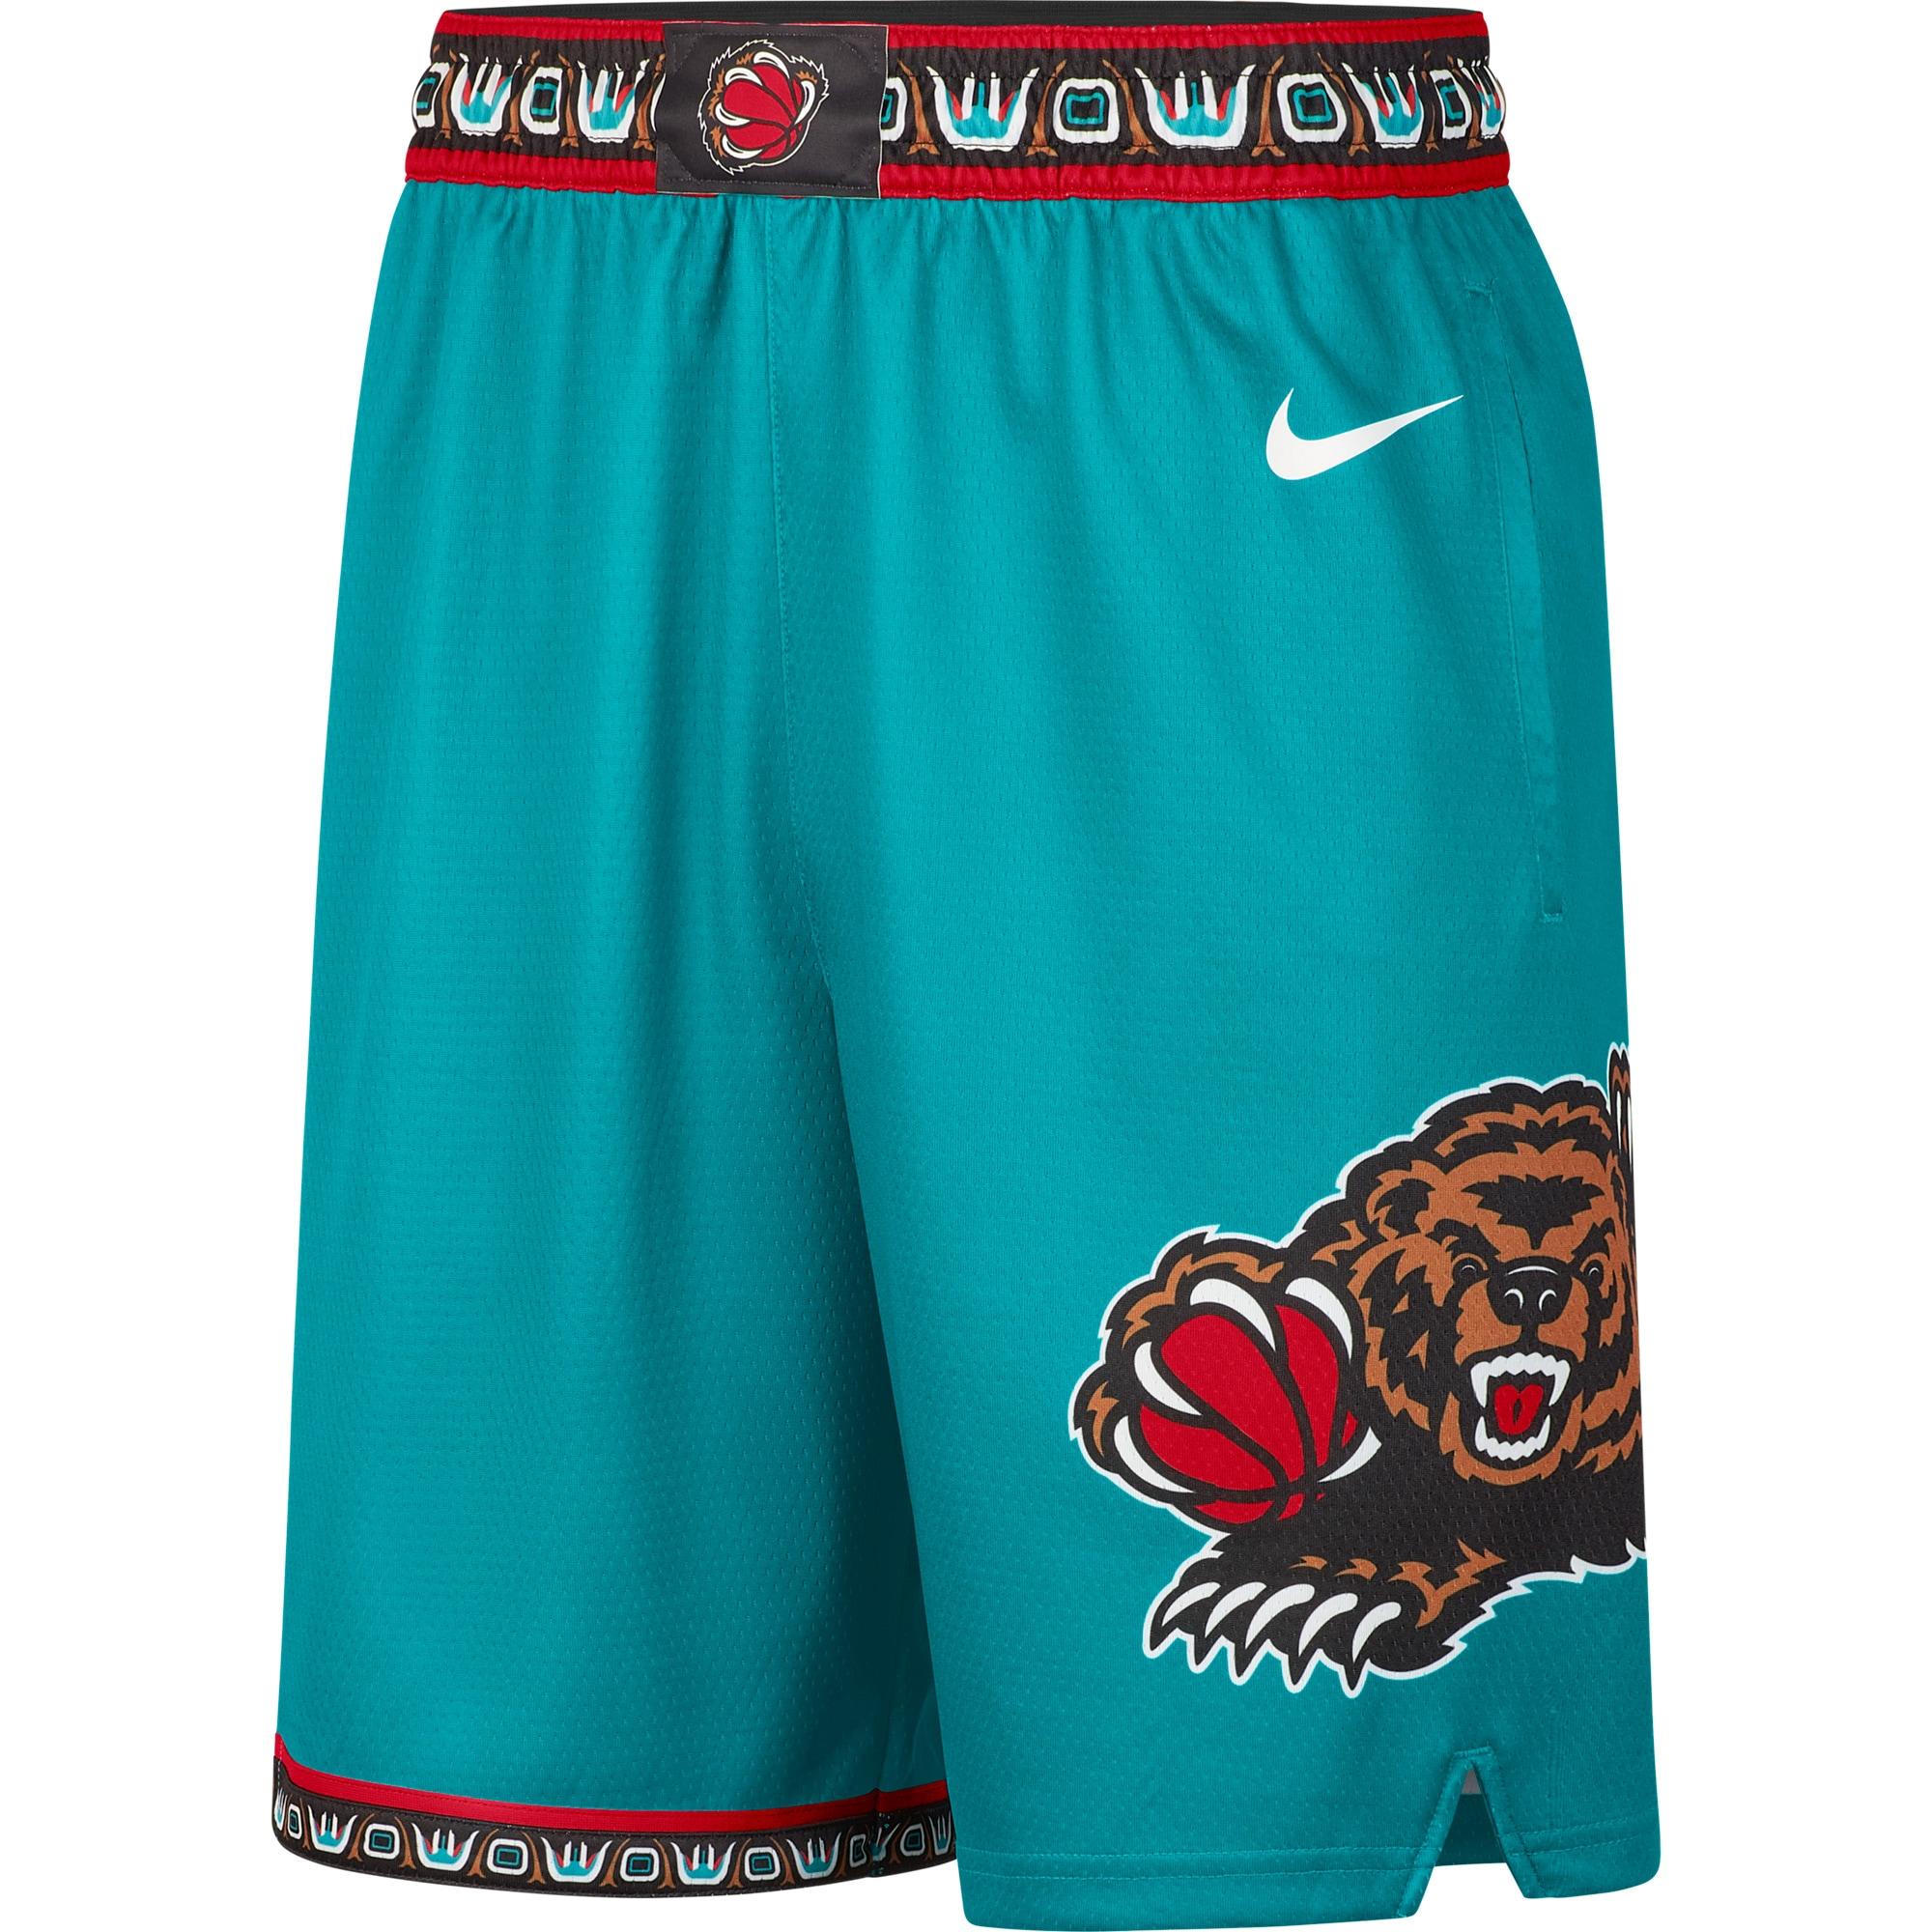 Memphis Grizzlies Nike Hardwood Classics Swingman Shorts - Teal